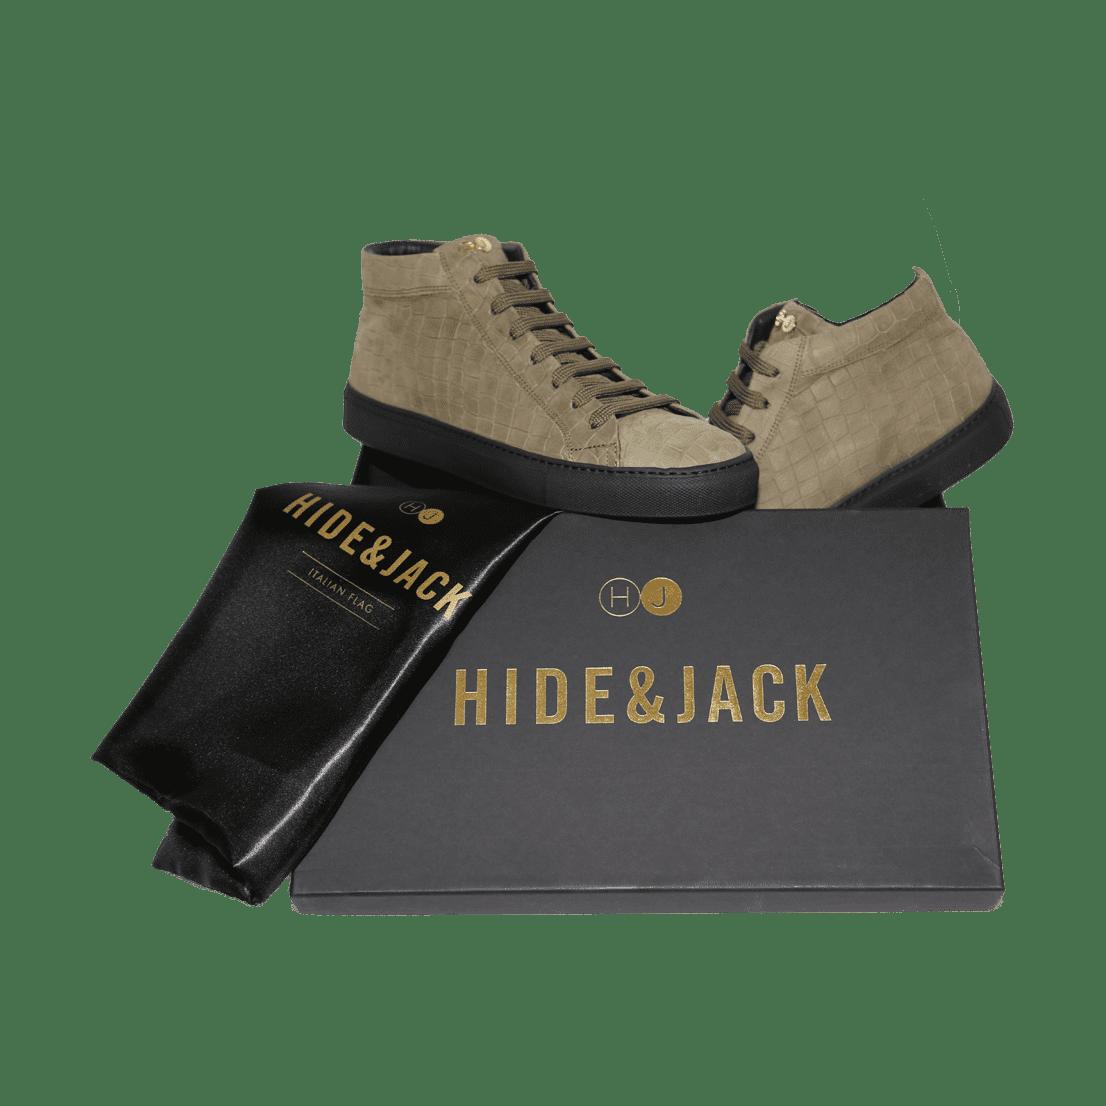 Cabinero Stiles Mensfashion Hide&Jack Boots in Berlin neue Kollektion AW2017/18-30